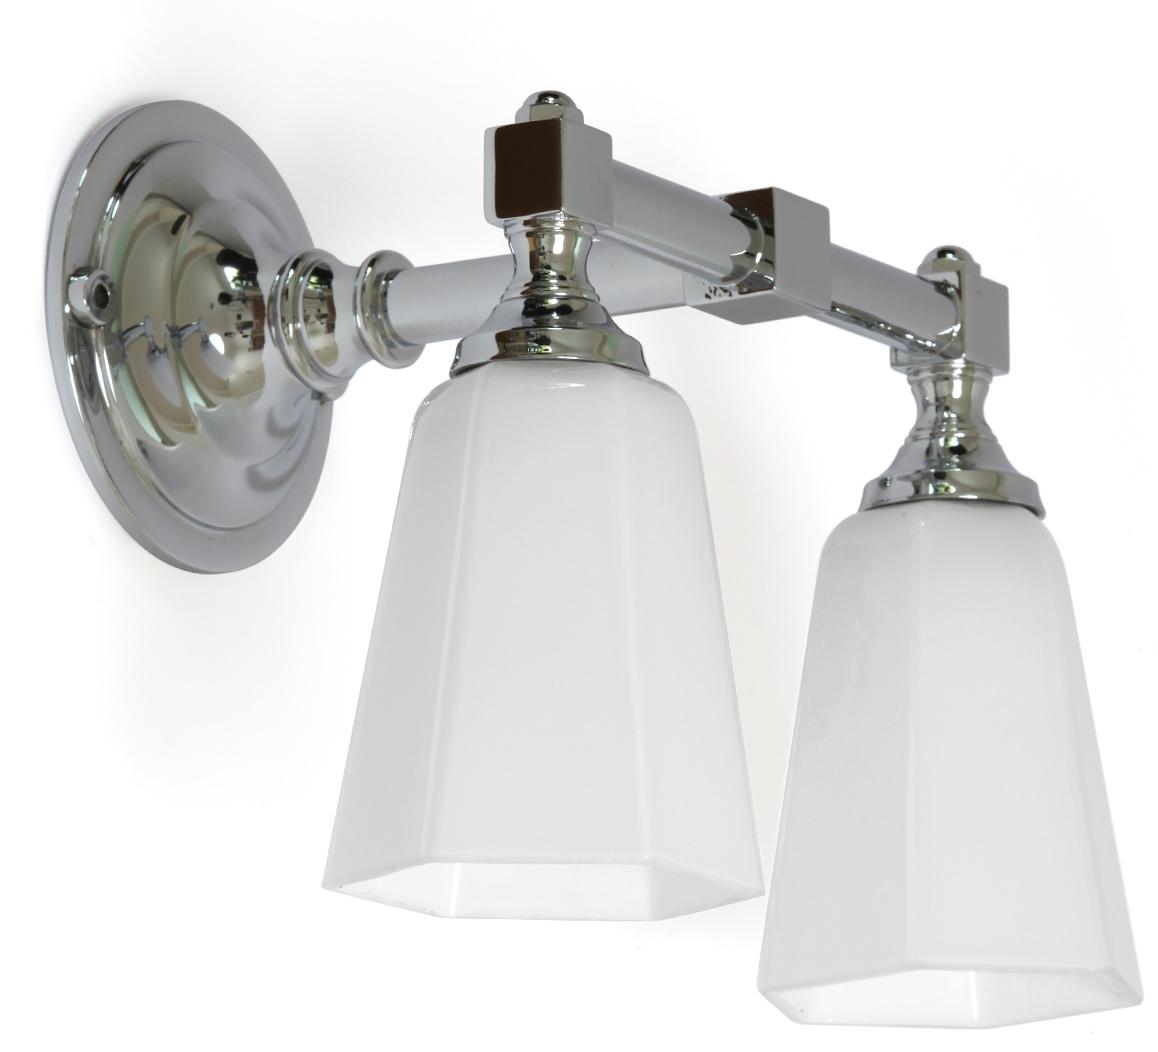 Best wandlampen f r badezimmer gallery house design - Badezimmer design ...